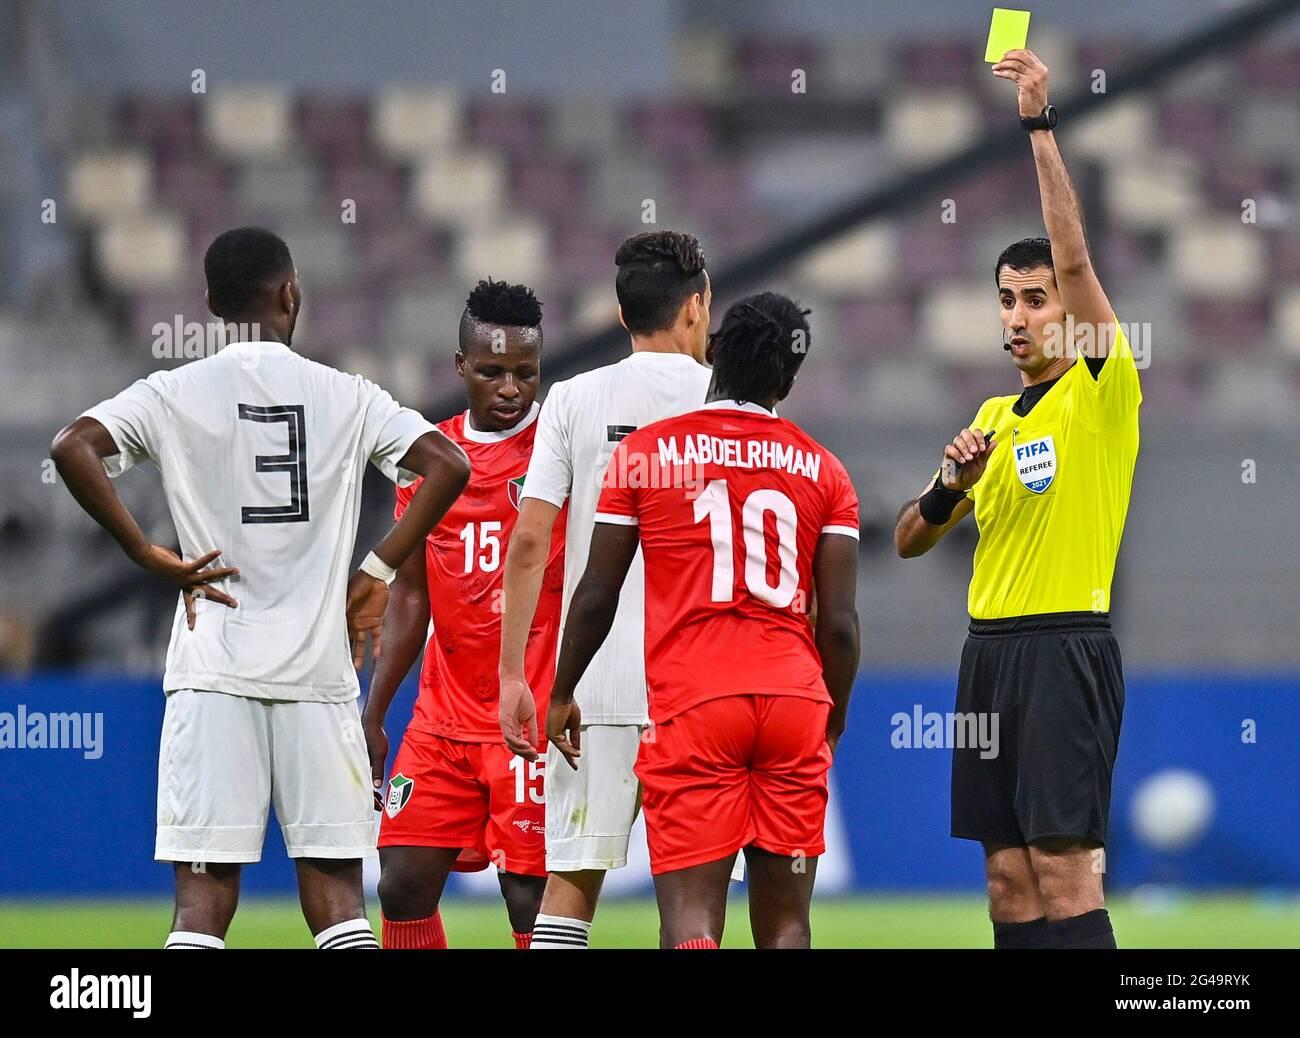 Doha, Qatar. 19 juin 2021. Saoud Al Adba, arbitre qatari (1er R), présente une carte jaune à Mohamed Abdelrhman (2e R) du Soudan lors du match de qualification de la coupe arabe de la FIFA au Qatar 2021 à Doha, Qatar, le 19 juin 2021. Credit: Nikku /Xinhua/Alay Live News Banque D'Images